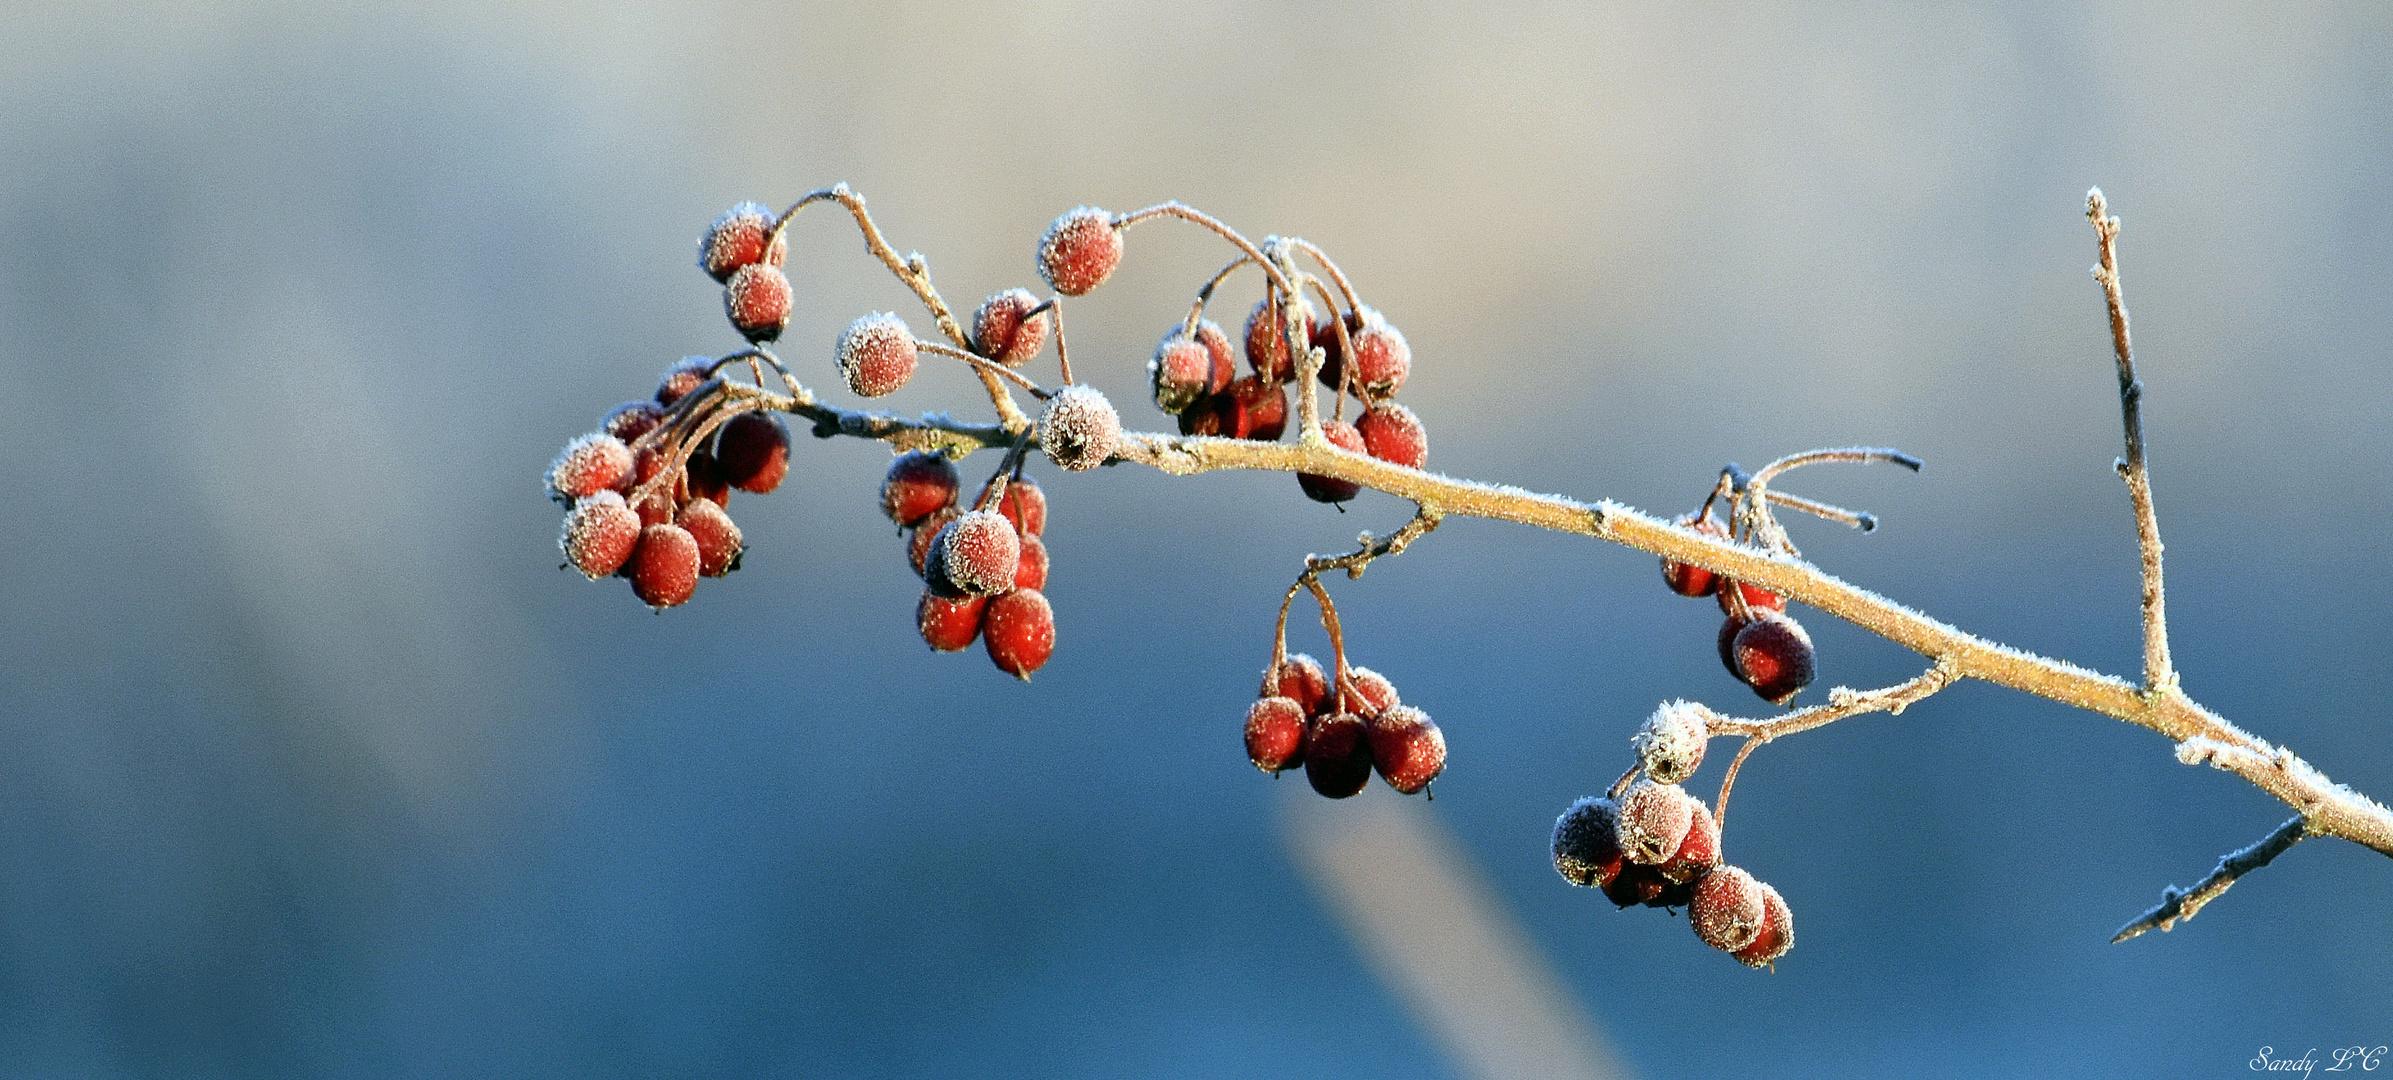 Flore du marais glacé